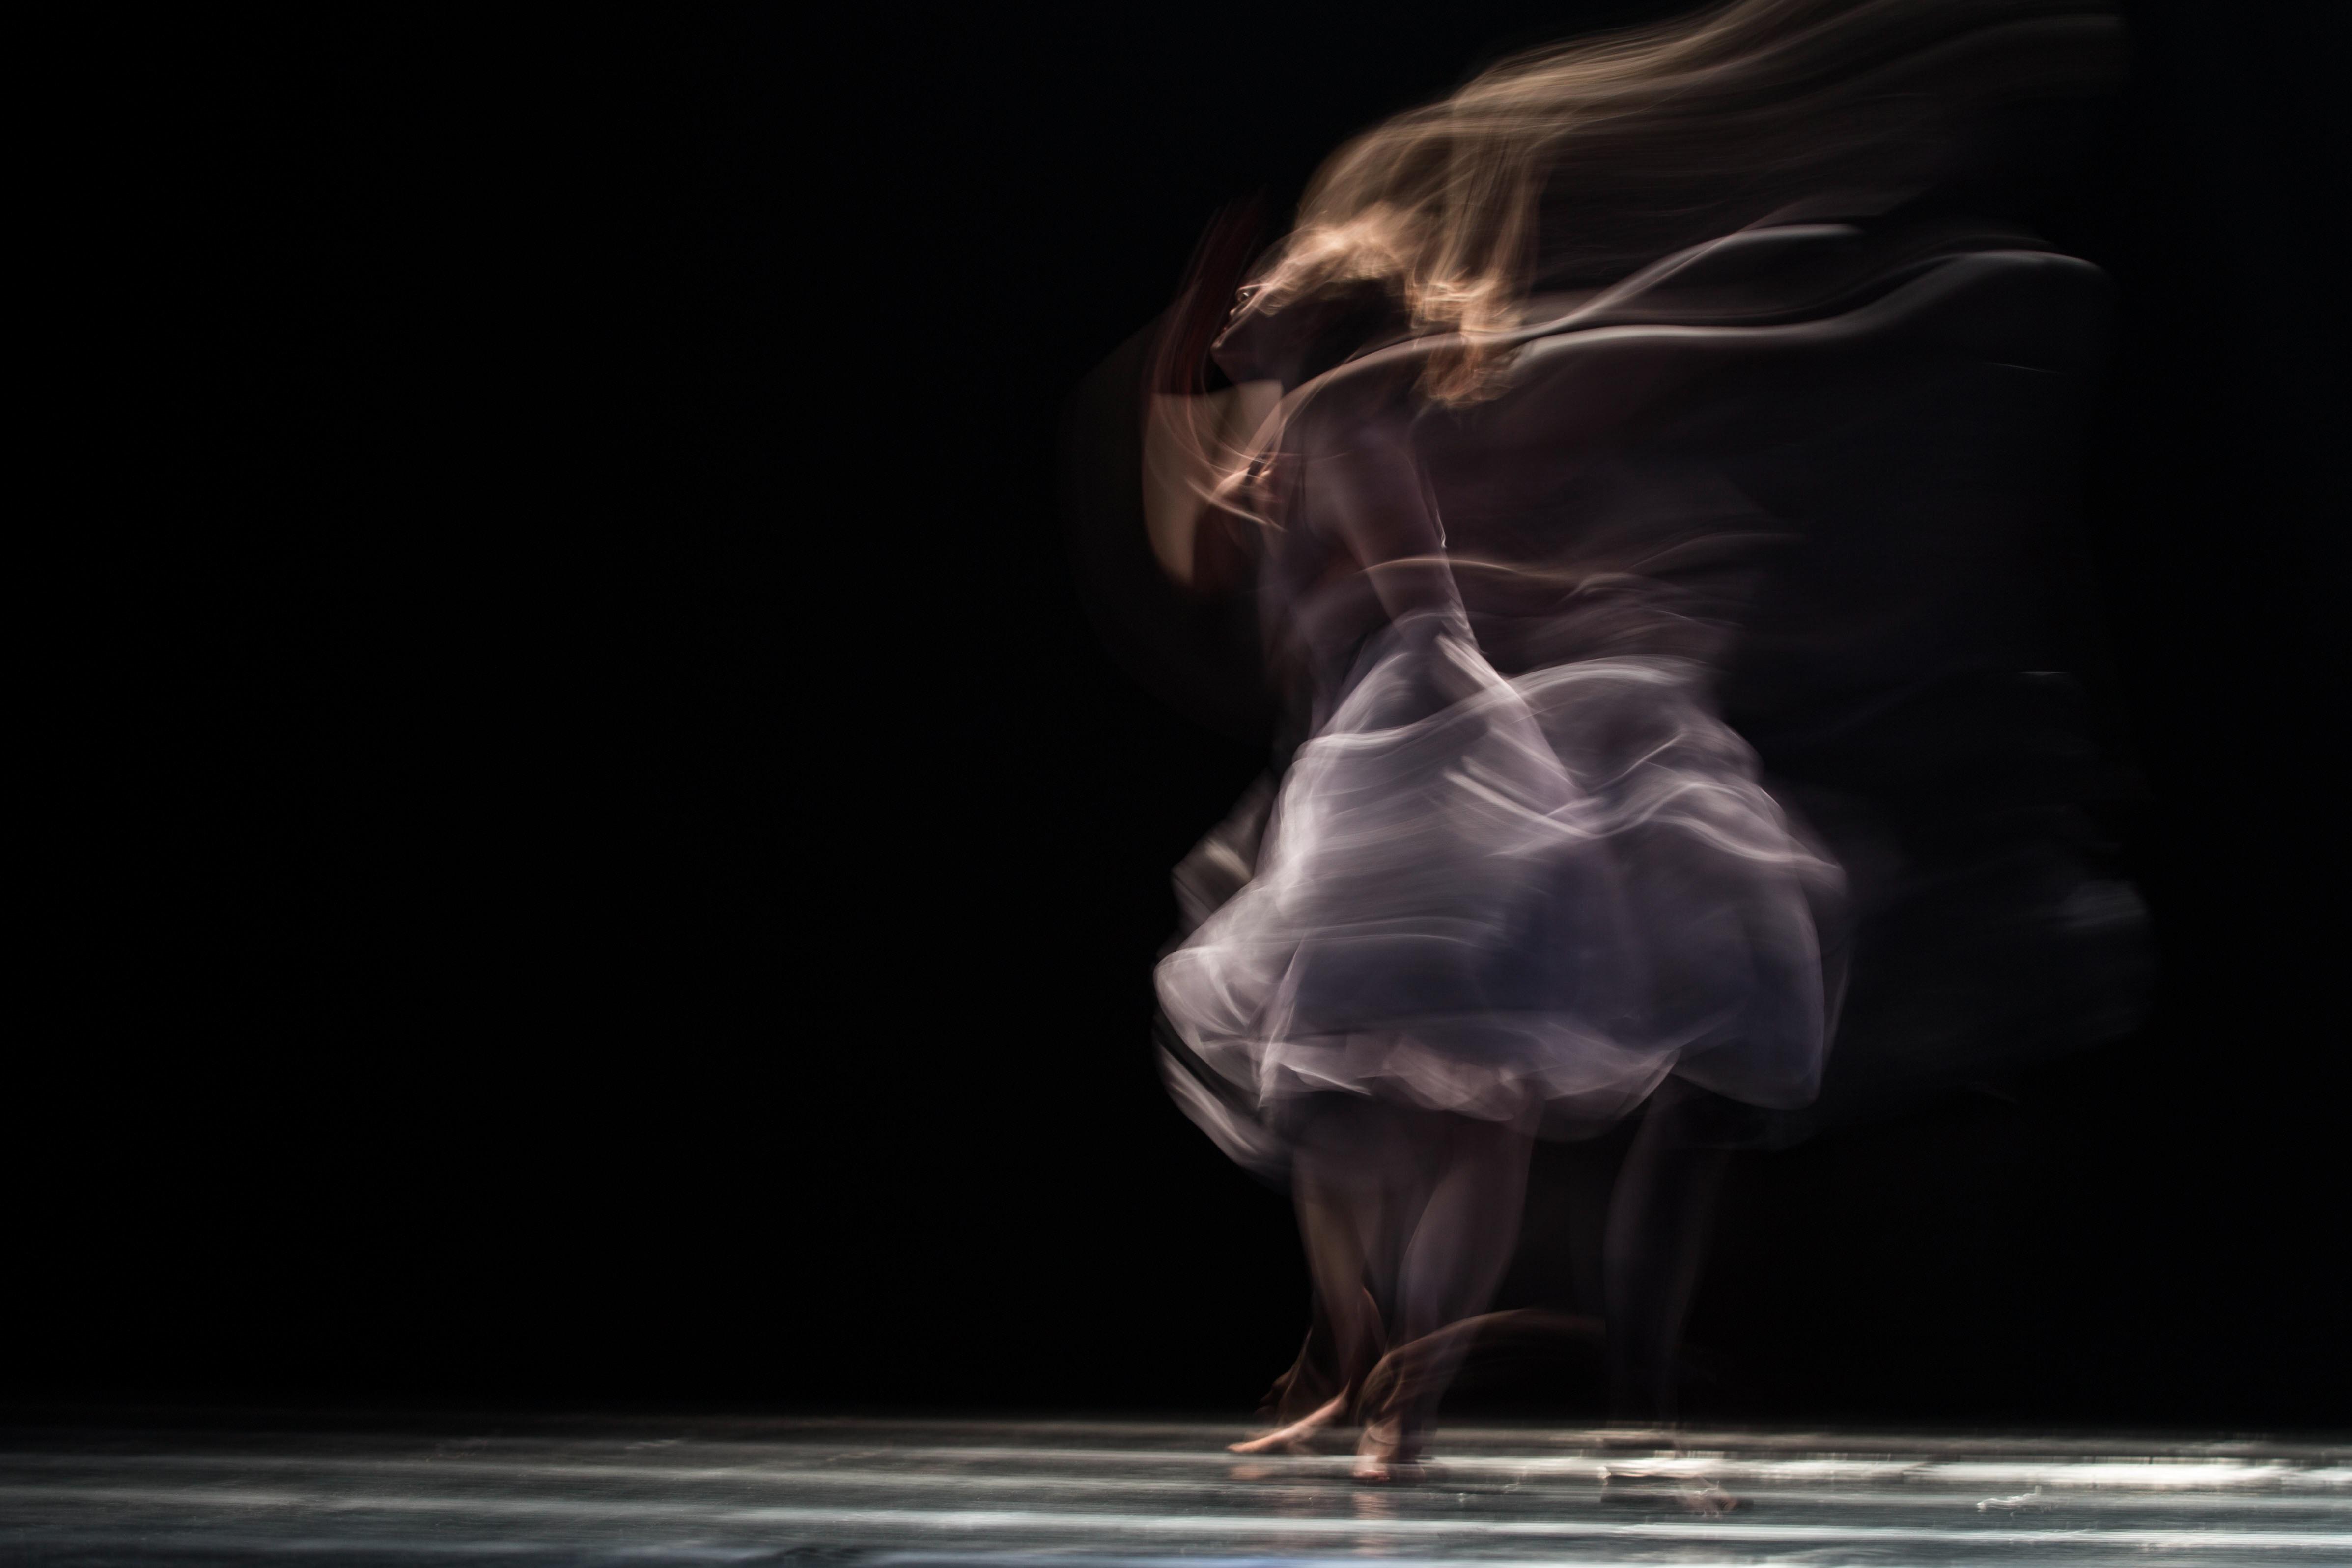 dancing woman on concrete pavement